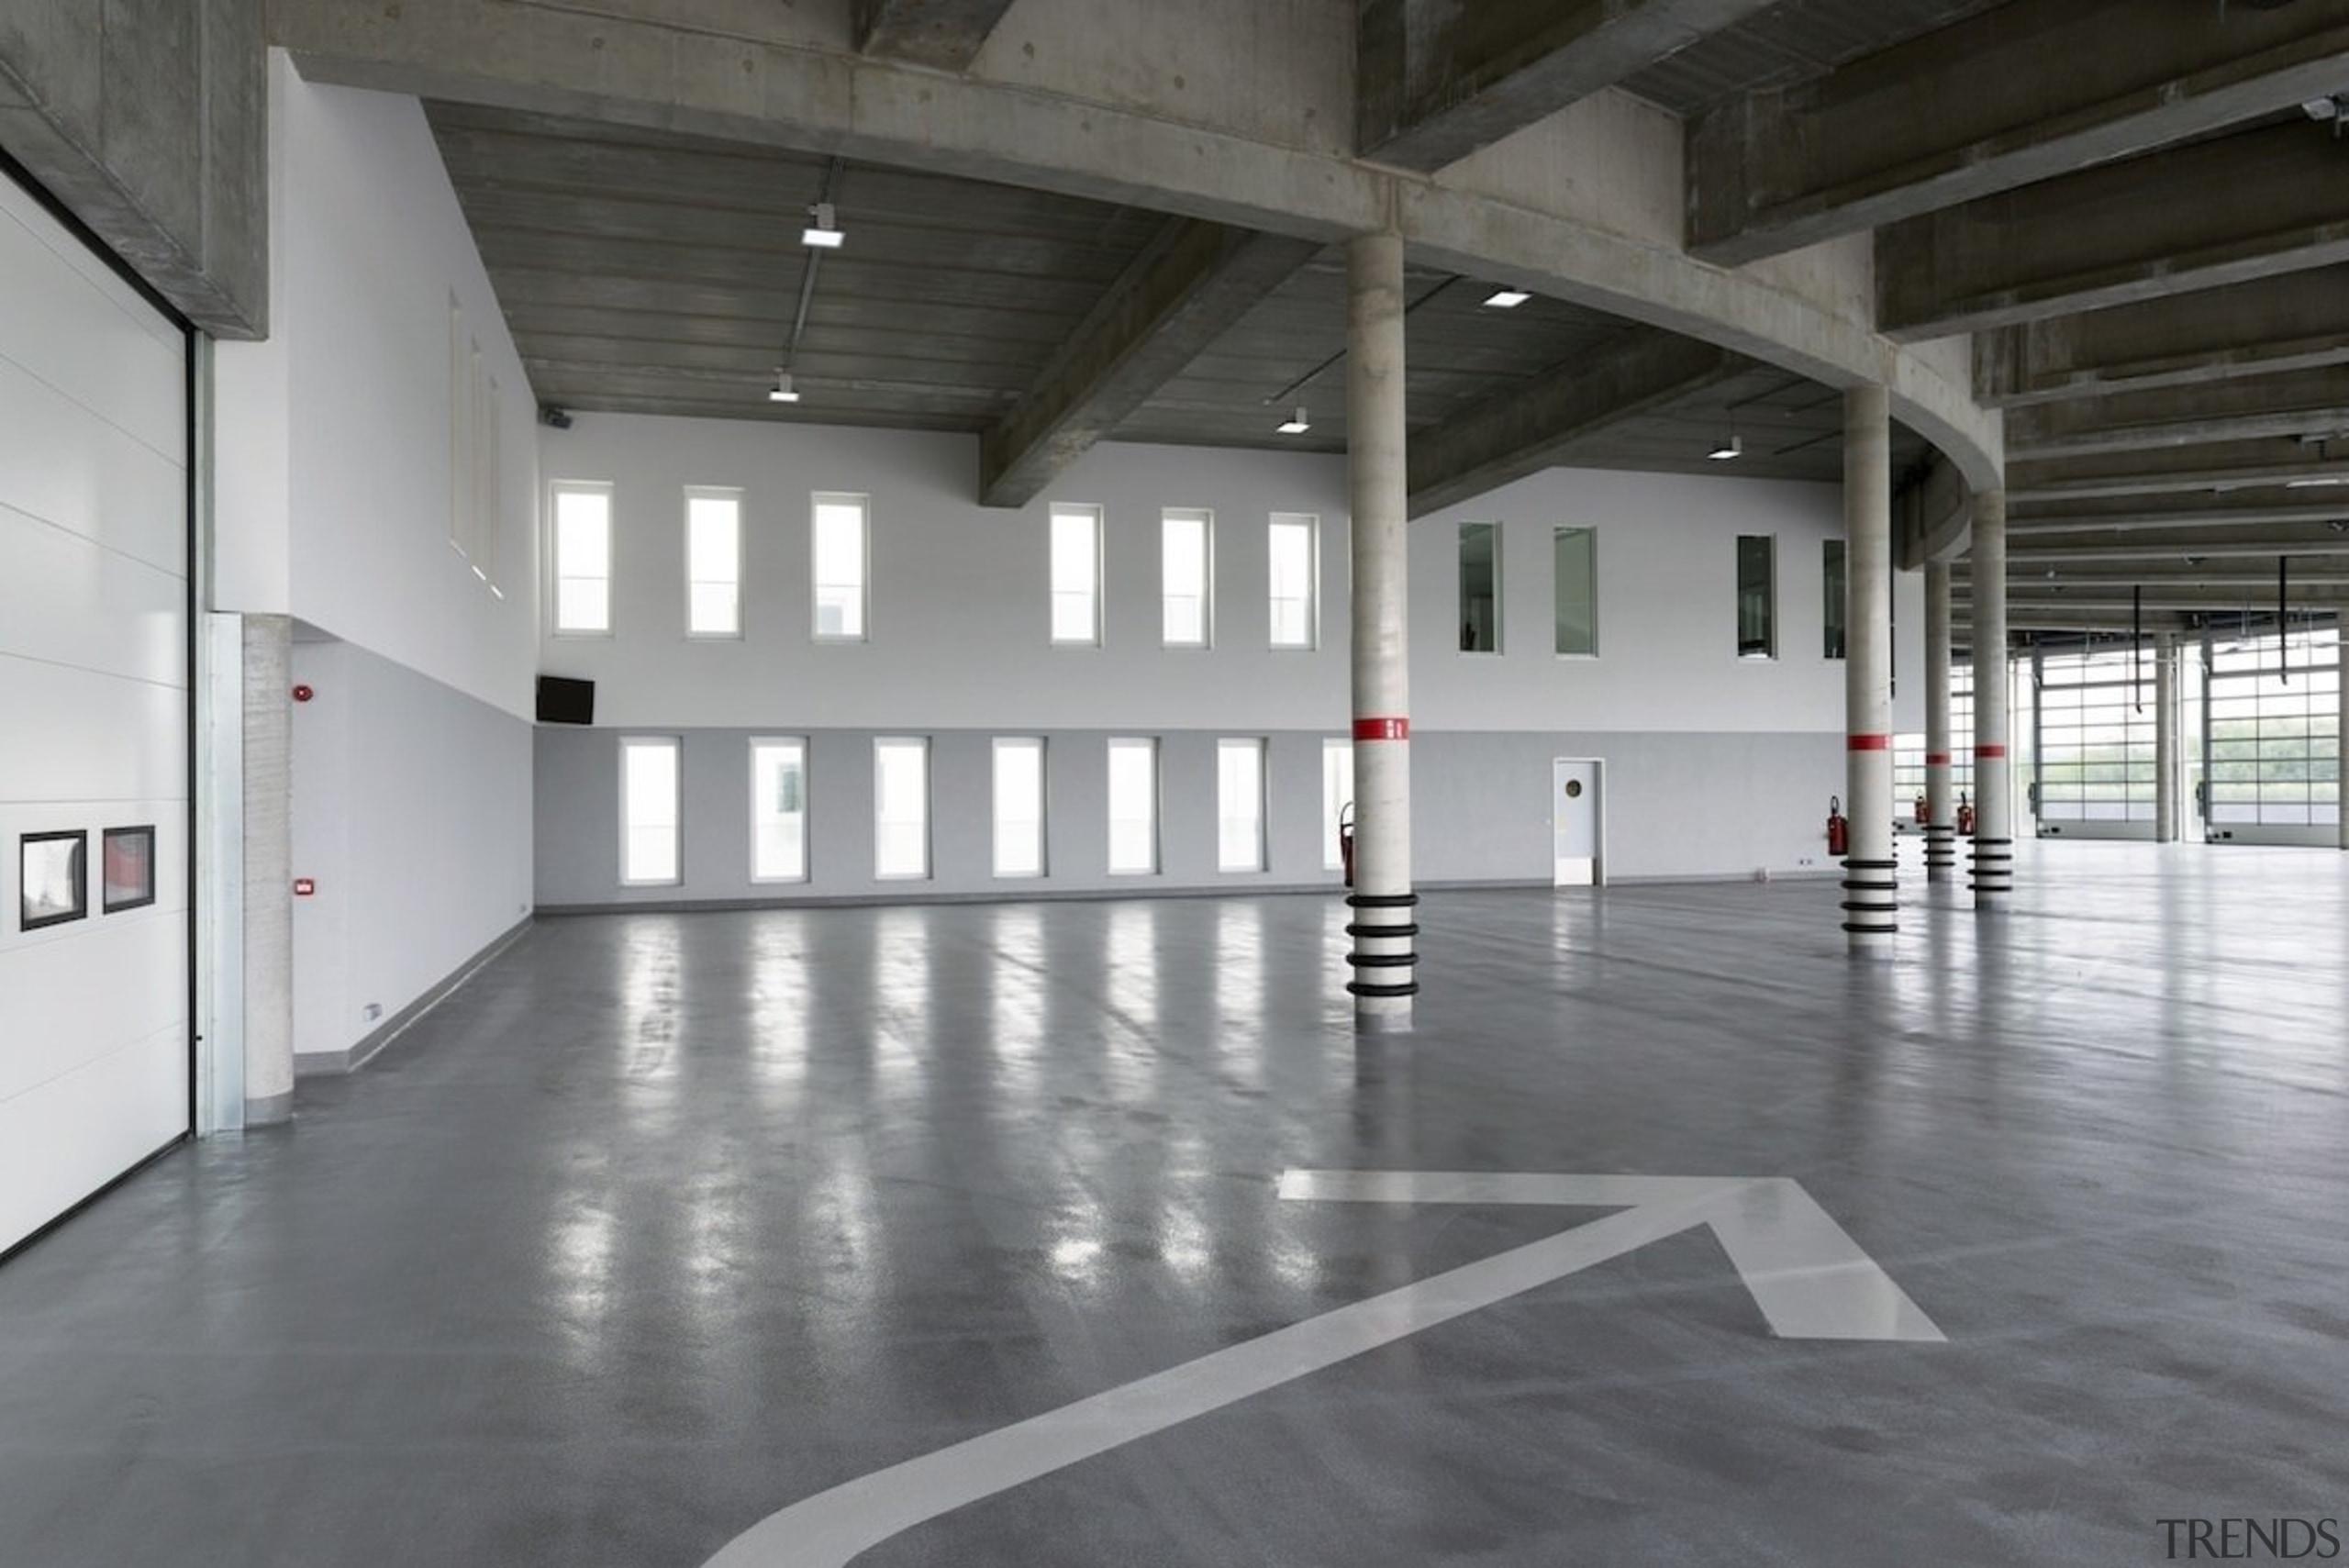 569 firestation - 569 firestation - architecture   architecture, daylighting, floor, flooring, hall, structure, gray